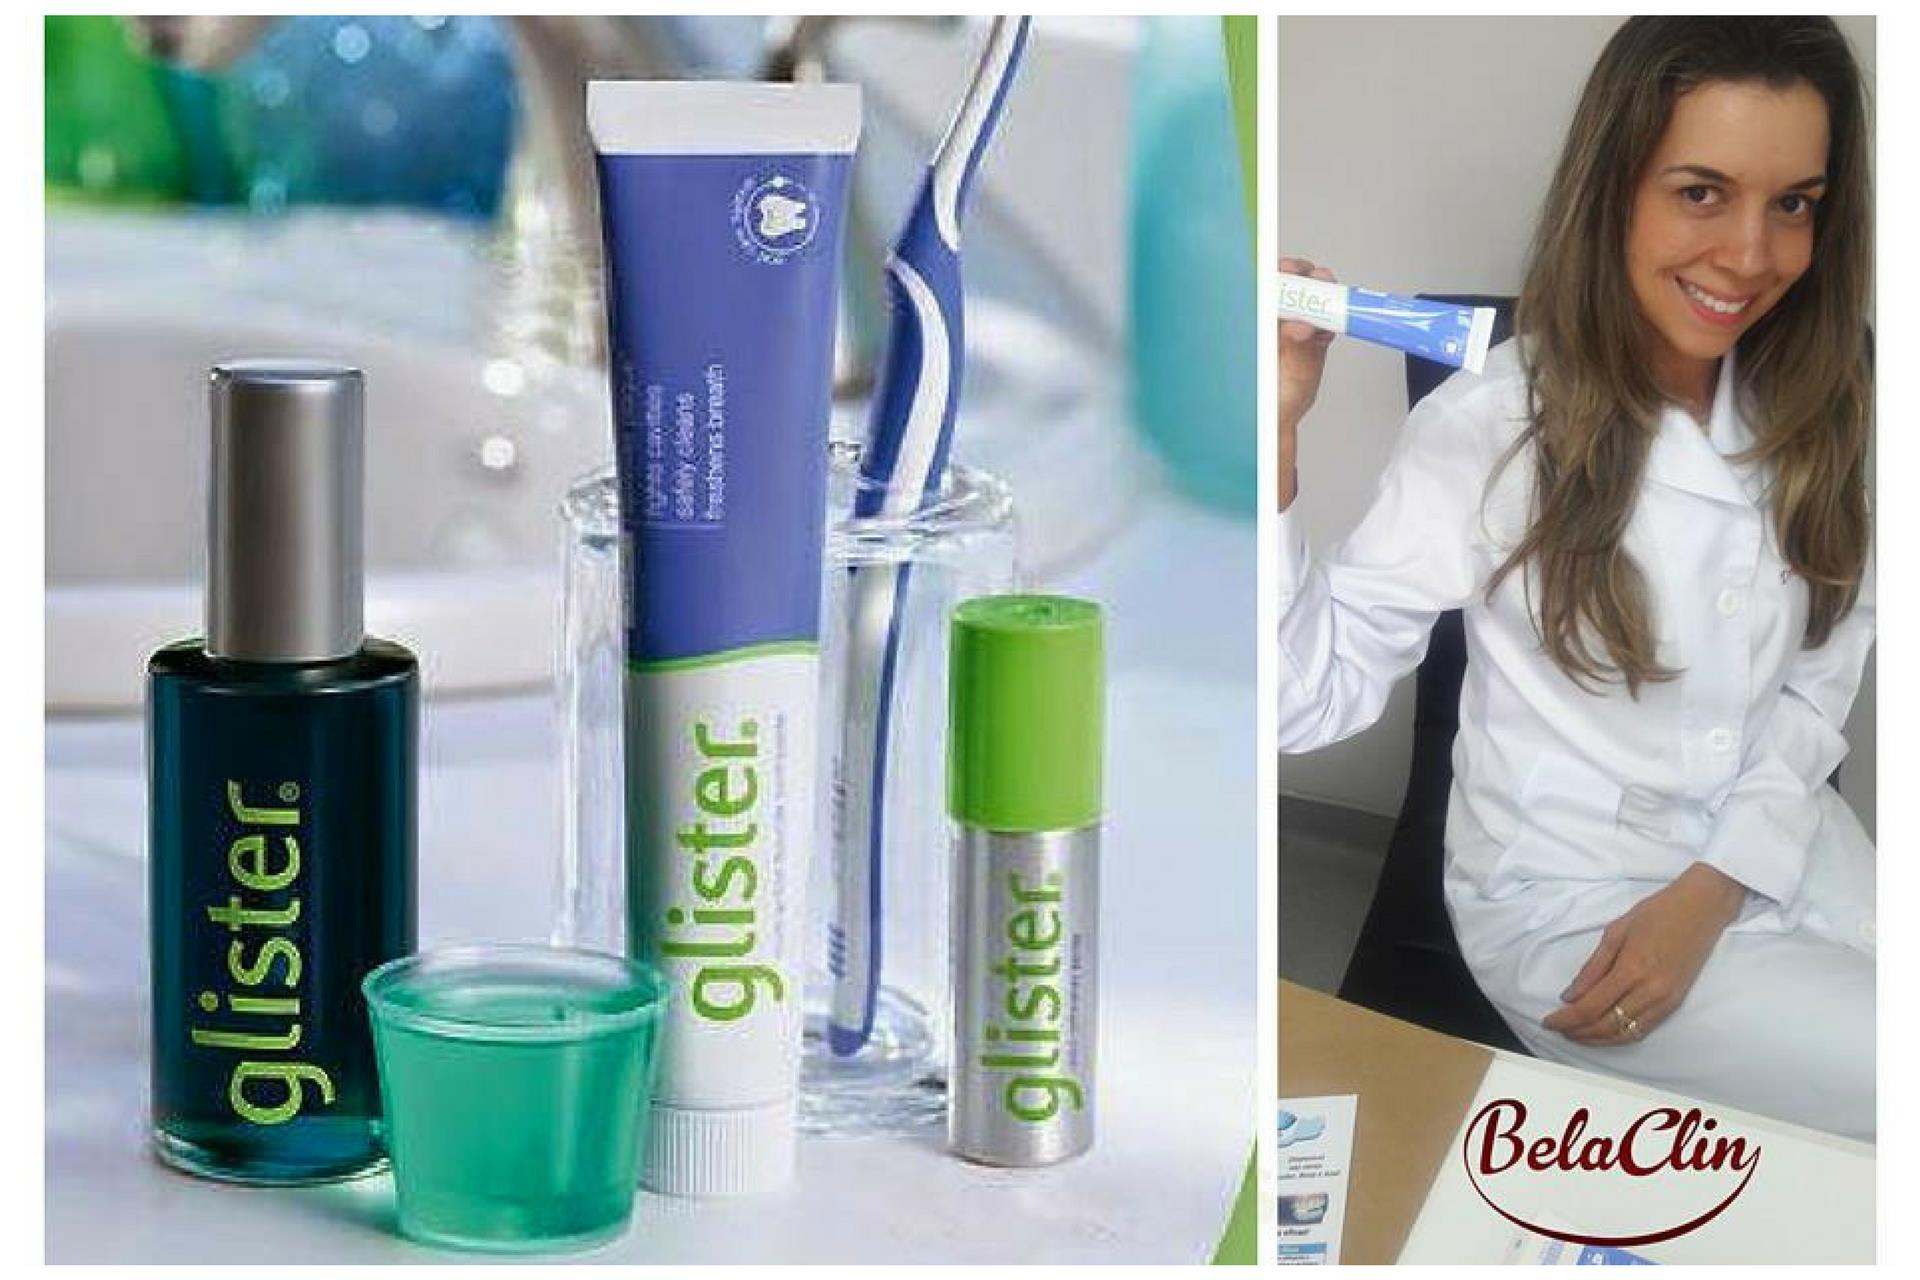 Glister™ Sistema de Tratamento Bucal